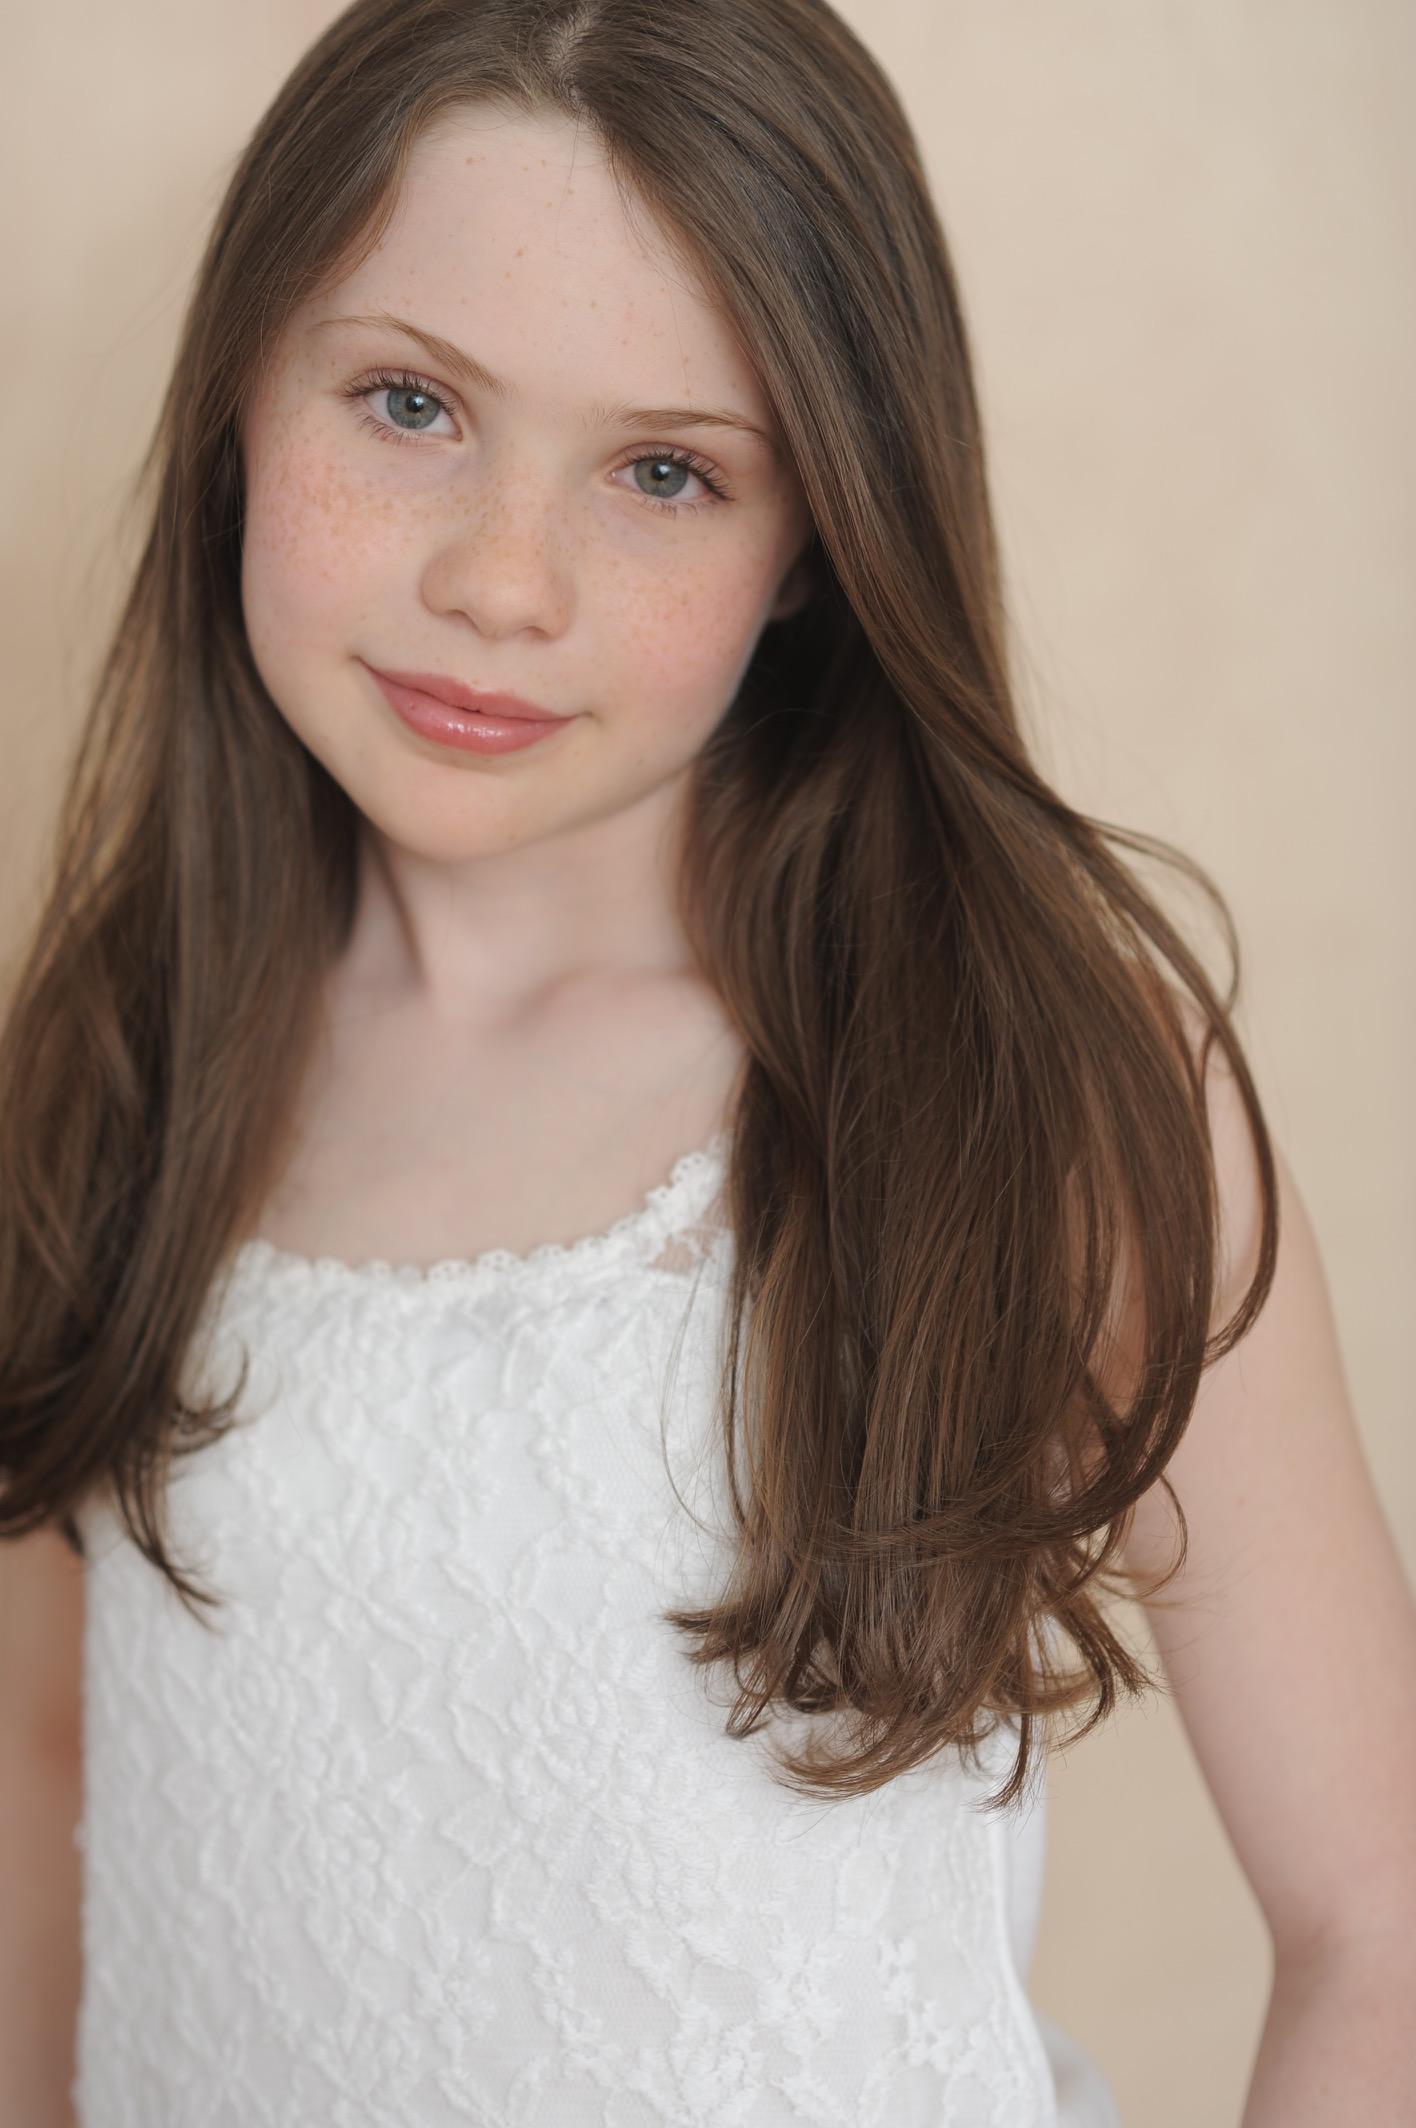 Abby Marazita